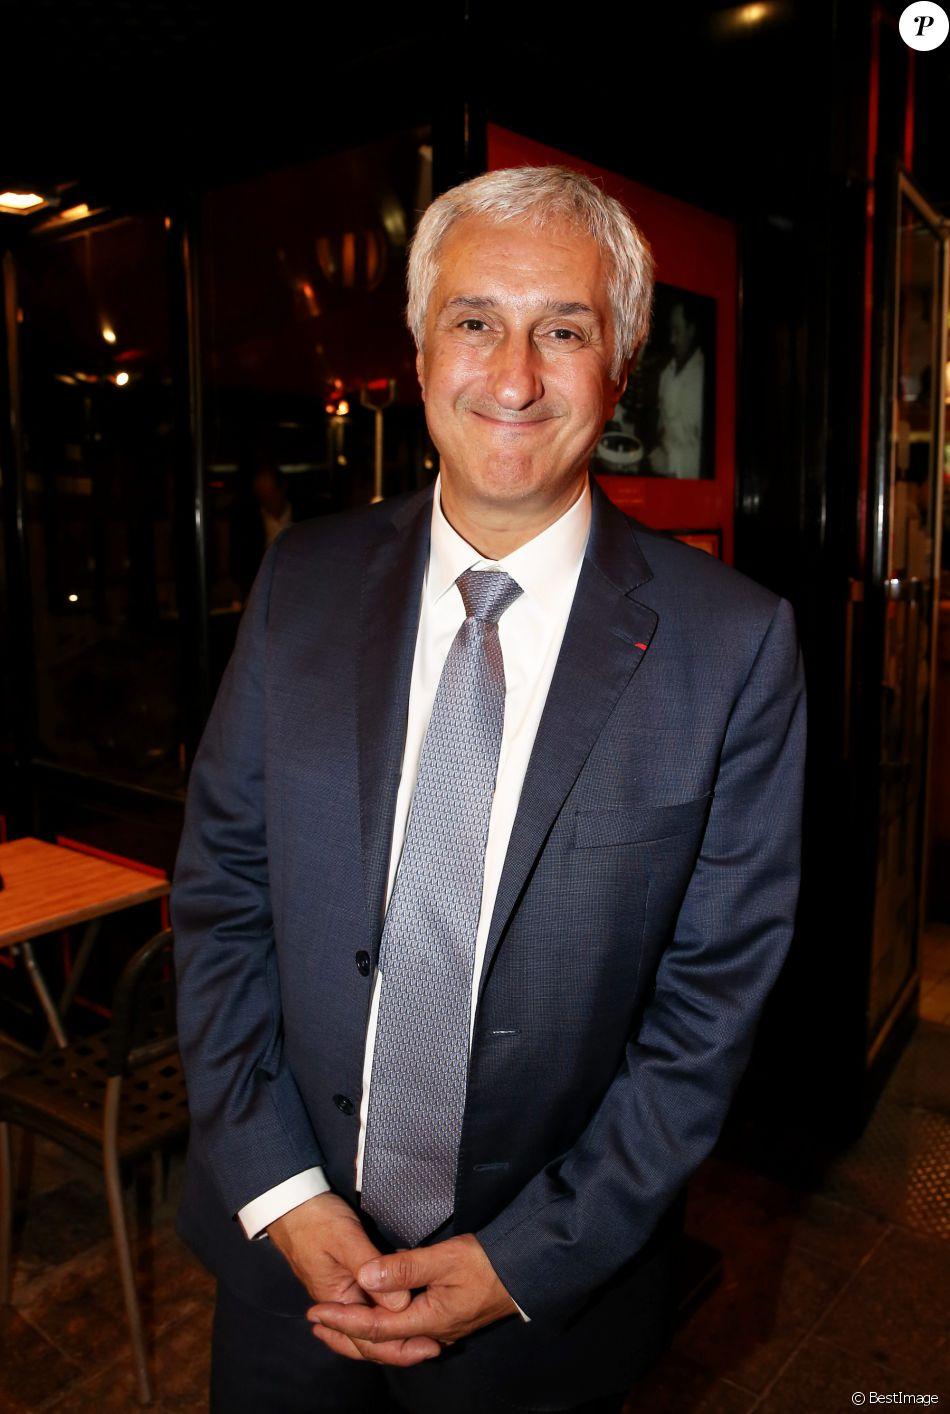 St phane layani pr sident directeur g n ral de semmaris - Directeur de restaurant ...